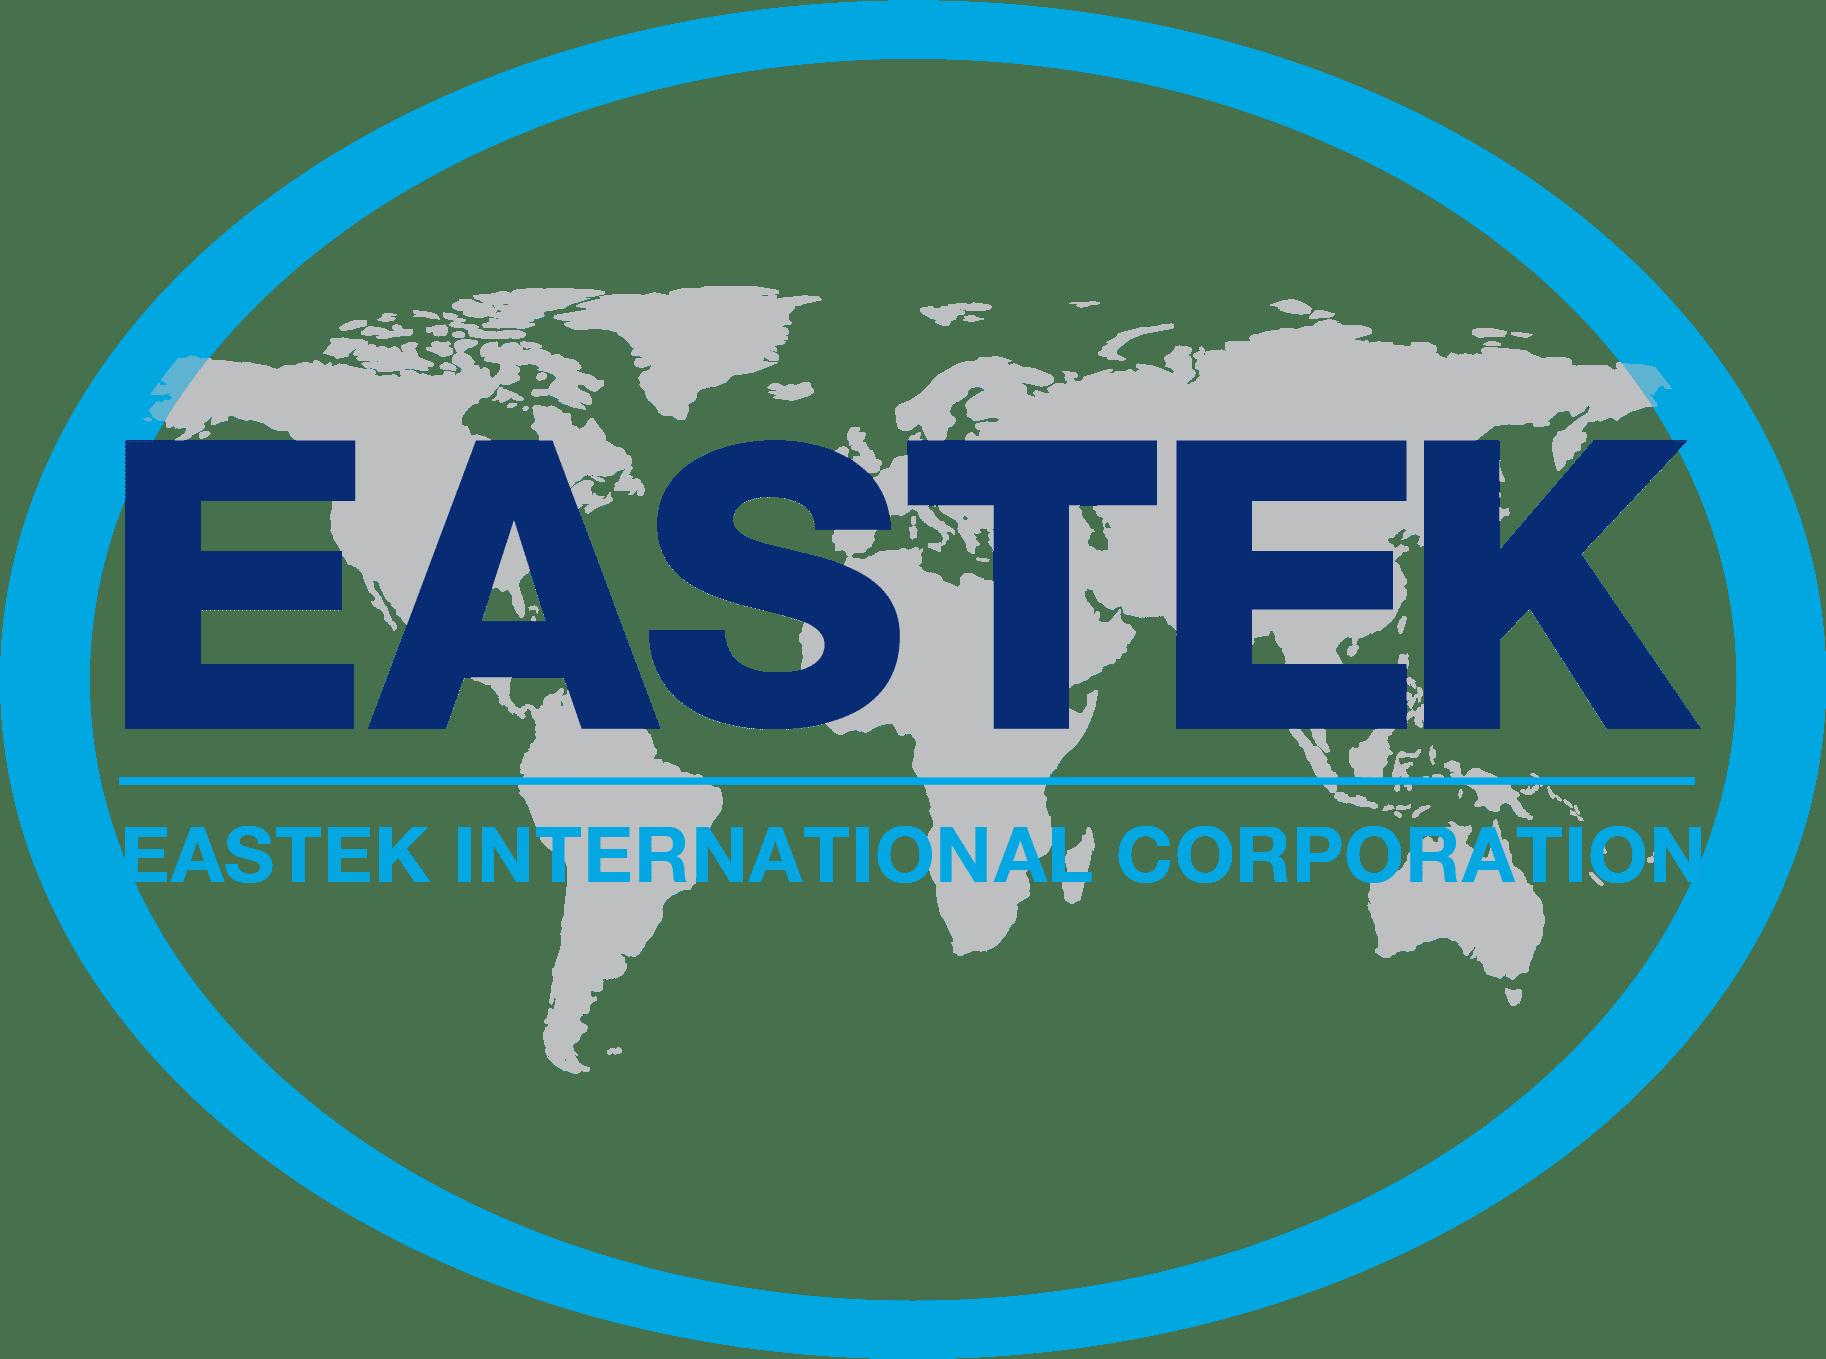 Eastek invests US$1.5 million in Zacatecas